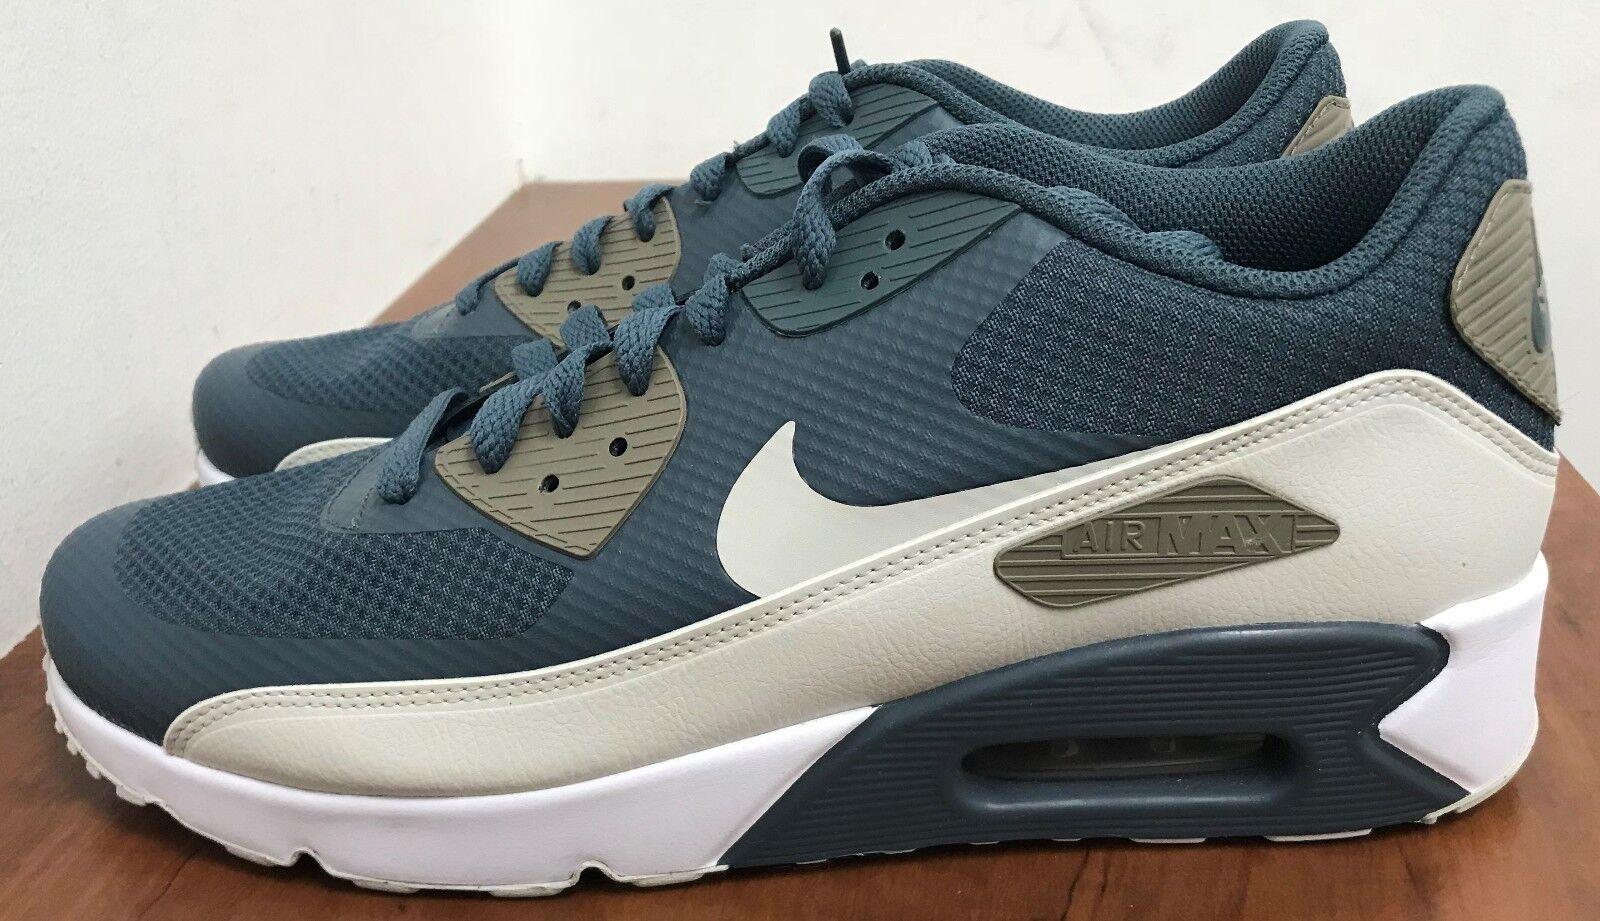 Nike Air Max 90 Ultra 2.0 Essential blueee Fox Light Bone 8 M US Mens (875695 401)